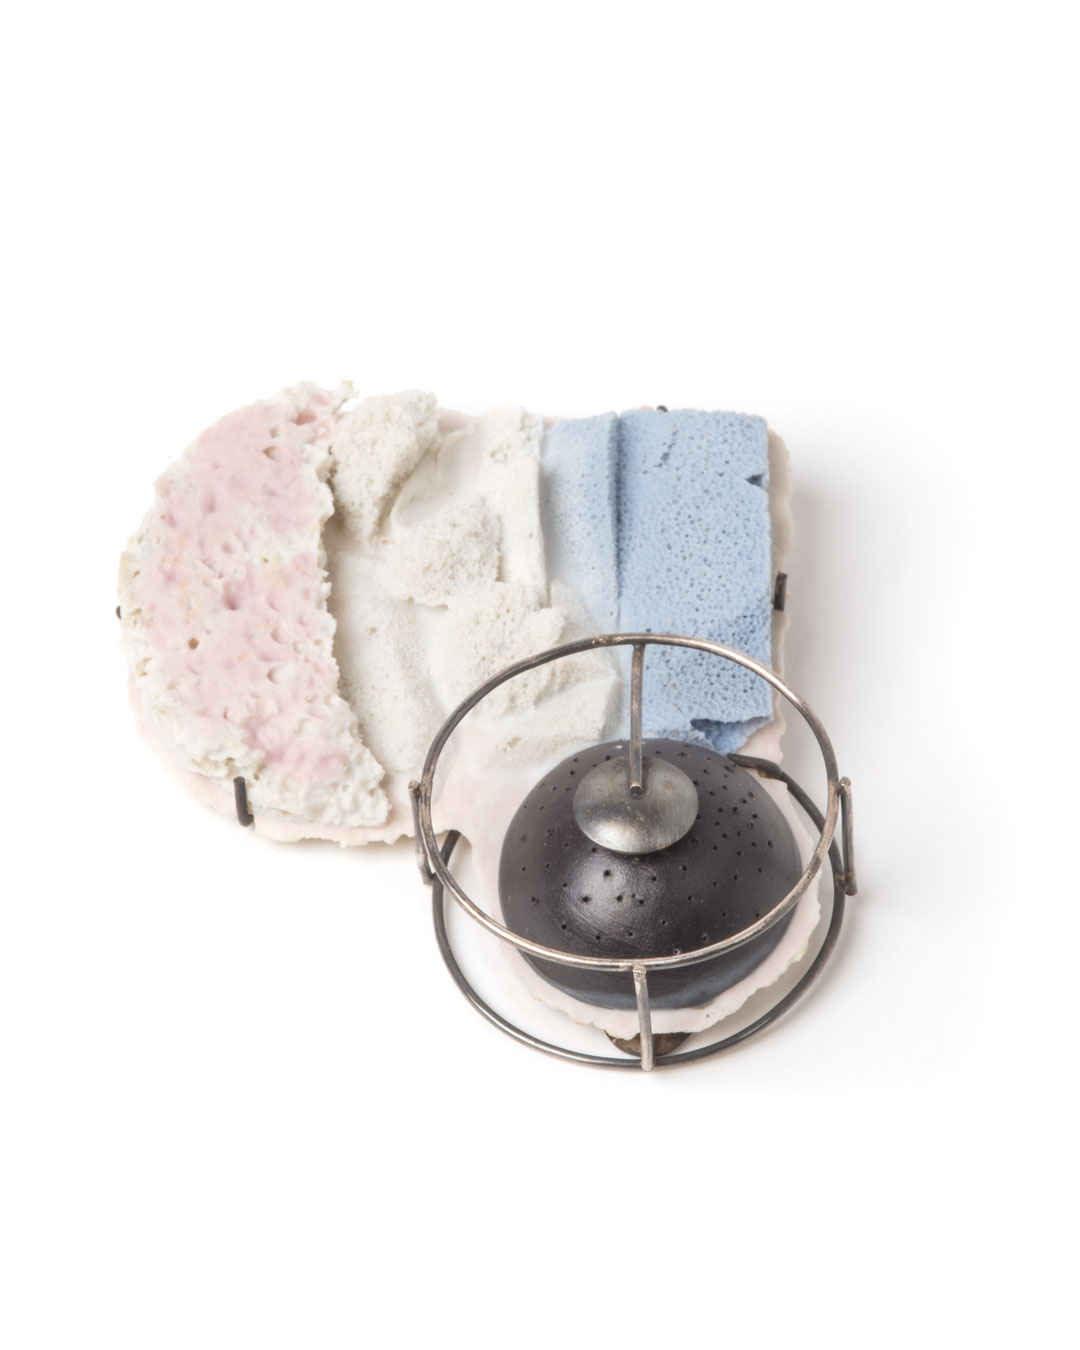 Trinidad Contreras, untitled, 2015, brooch; porcelain, oxidised silver, steel, 70 x 80 x 20 mm, €920